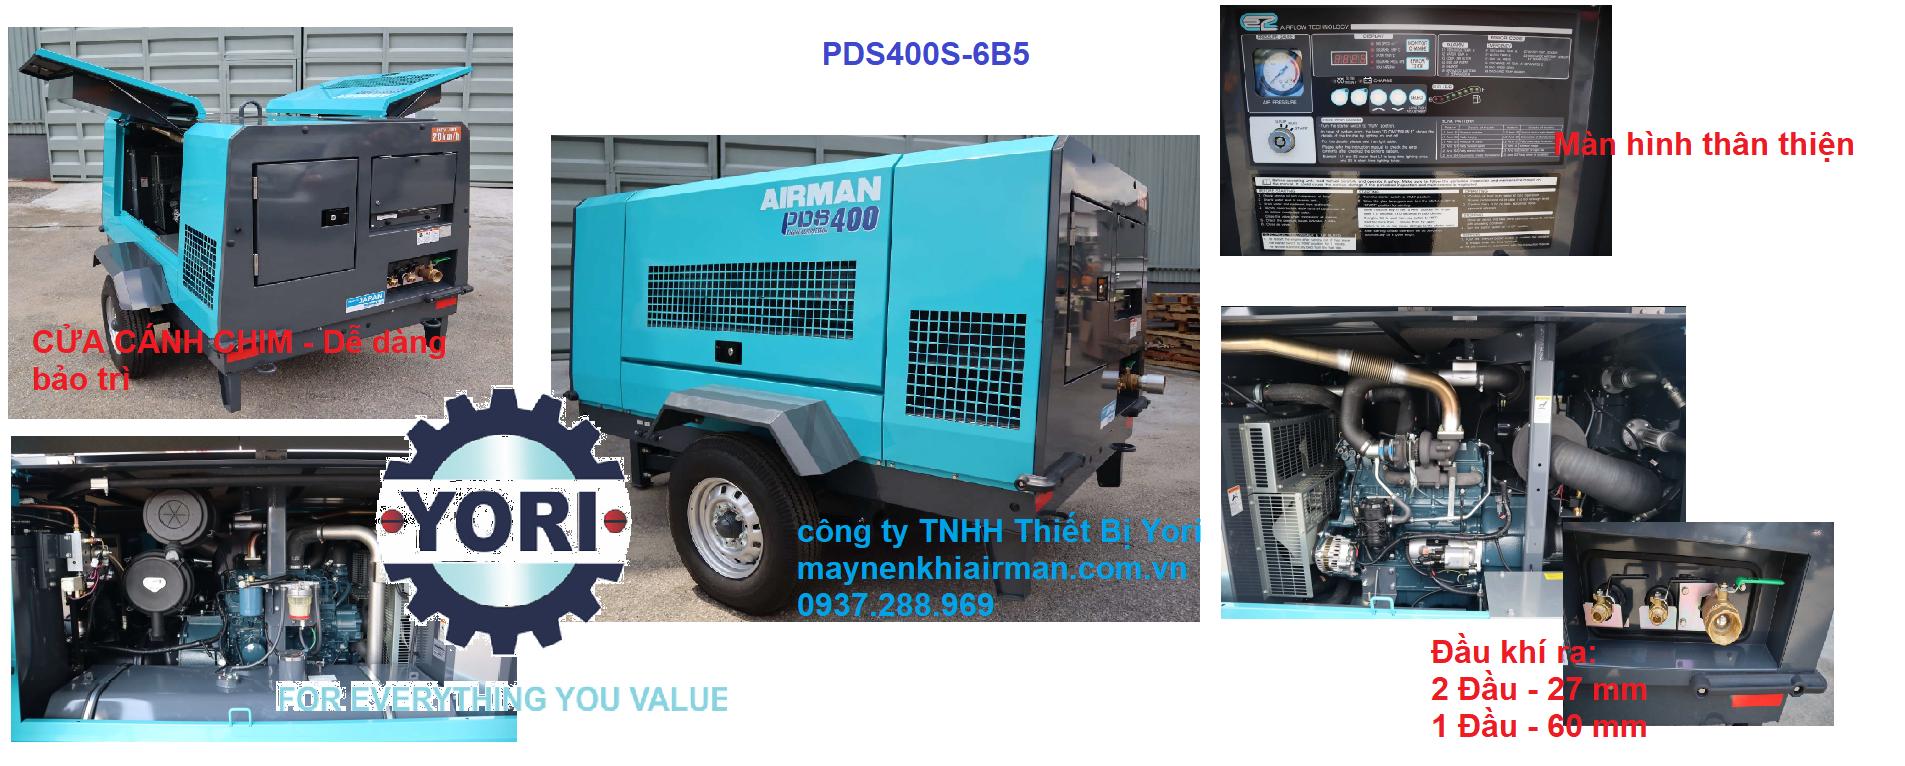 PDS400S-6B5 sự cải tiến từ PDS390